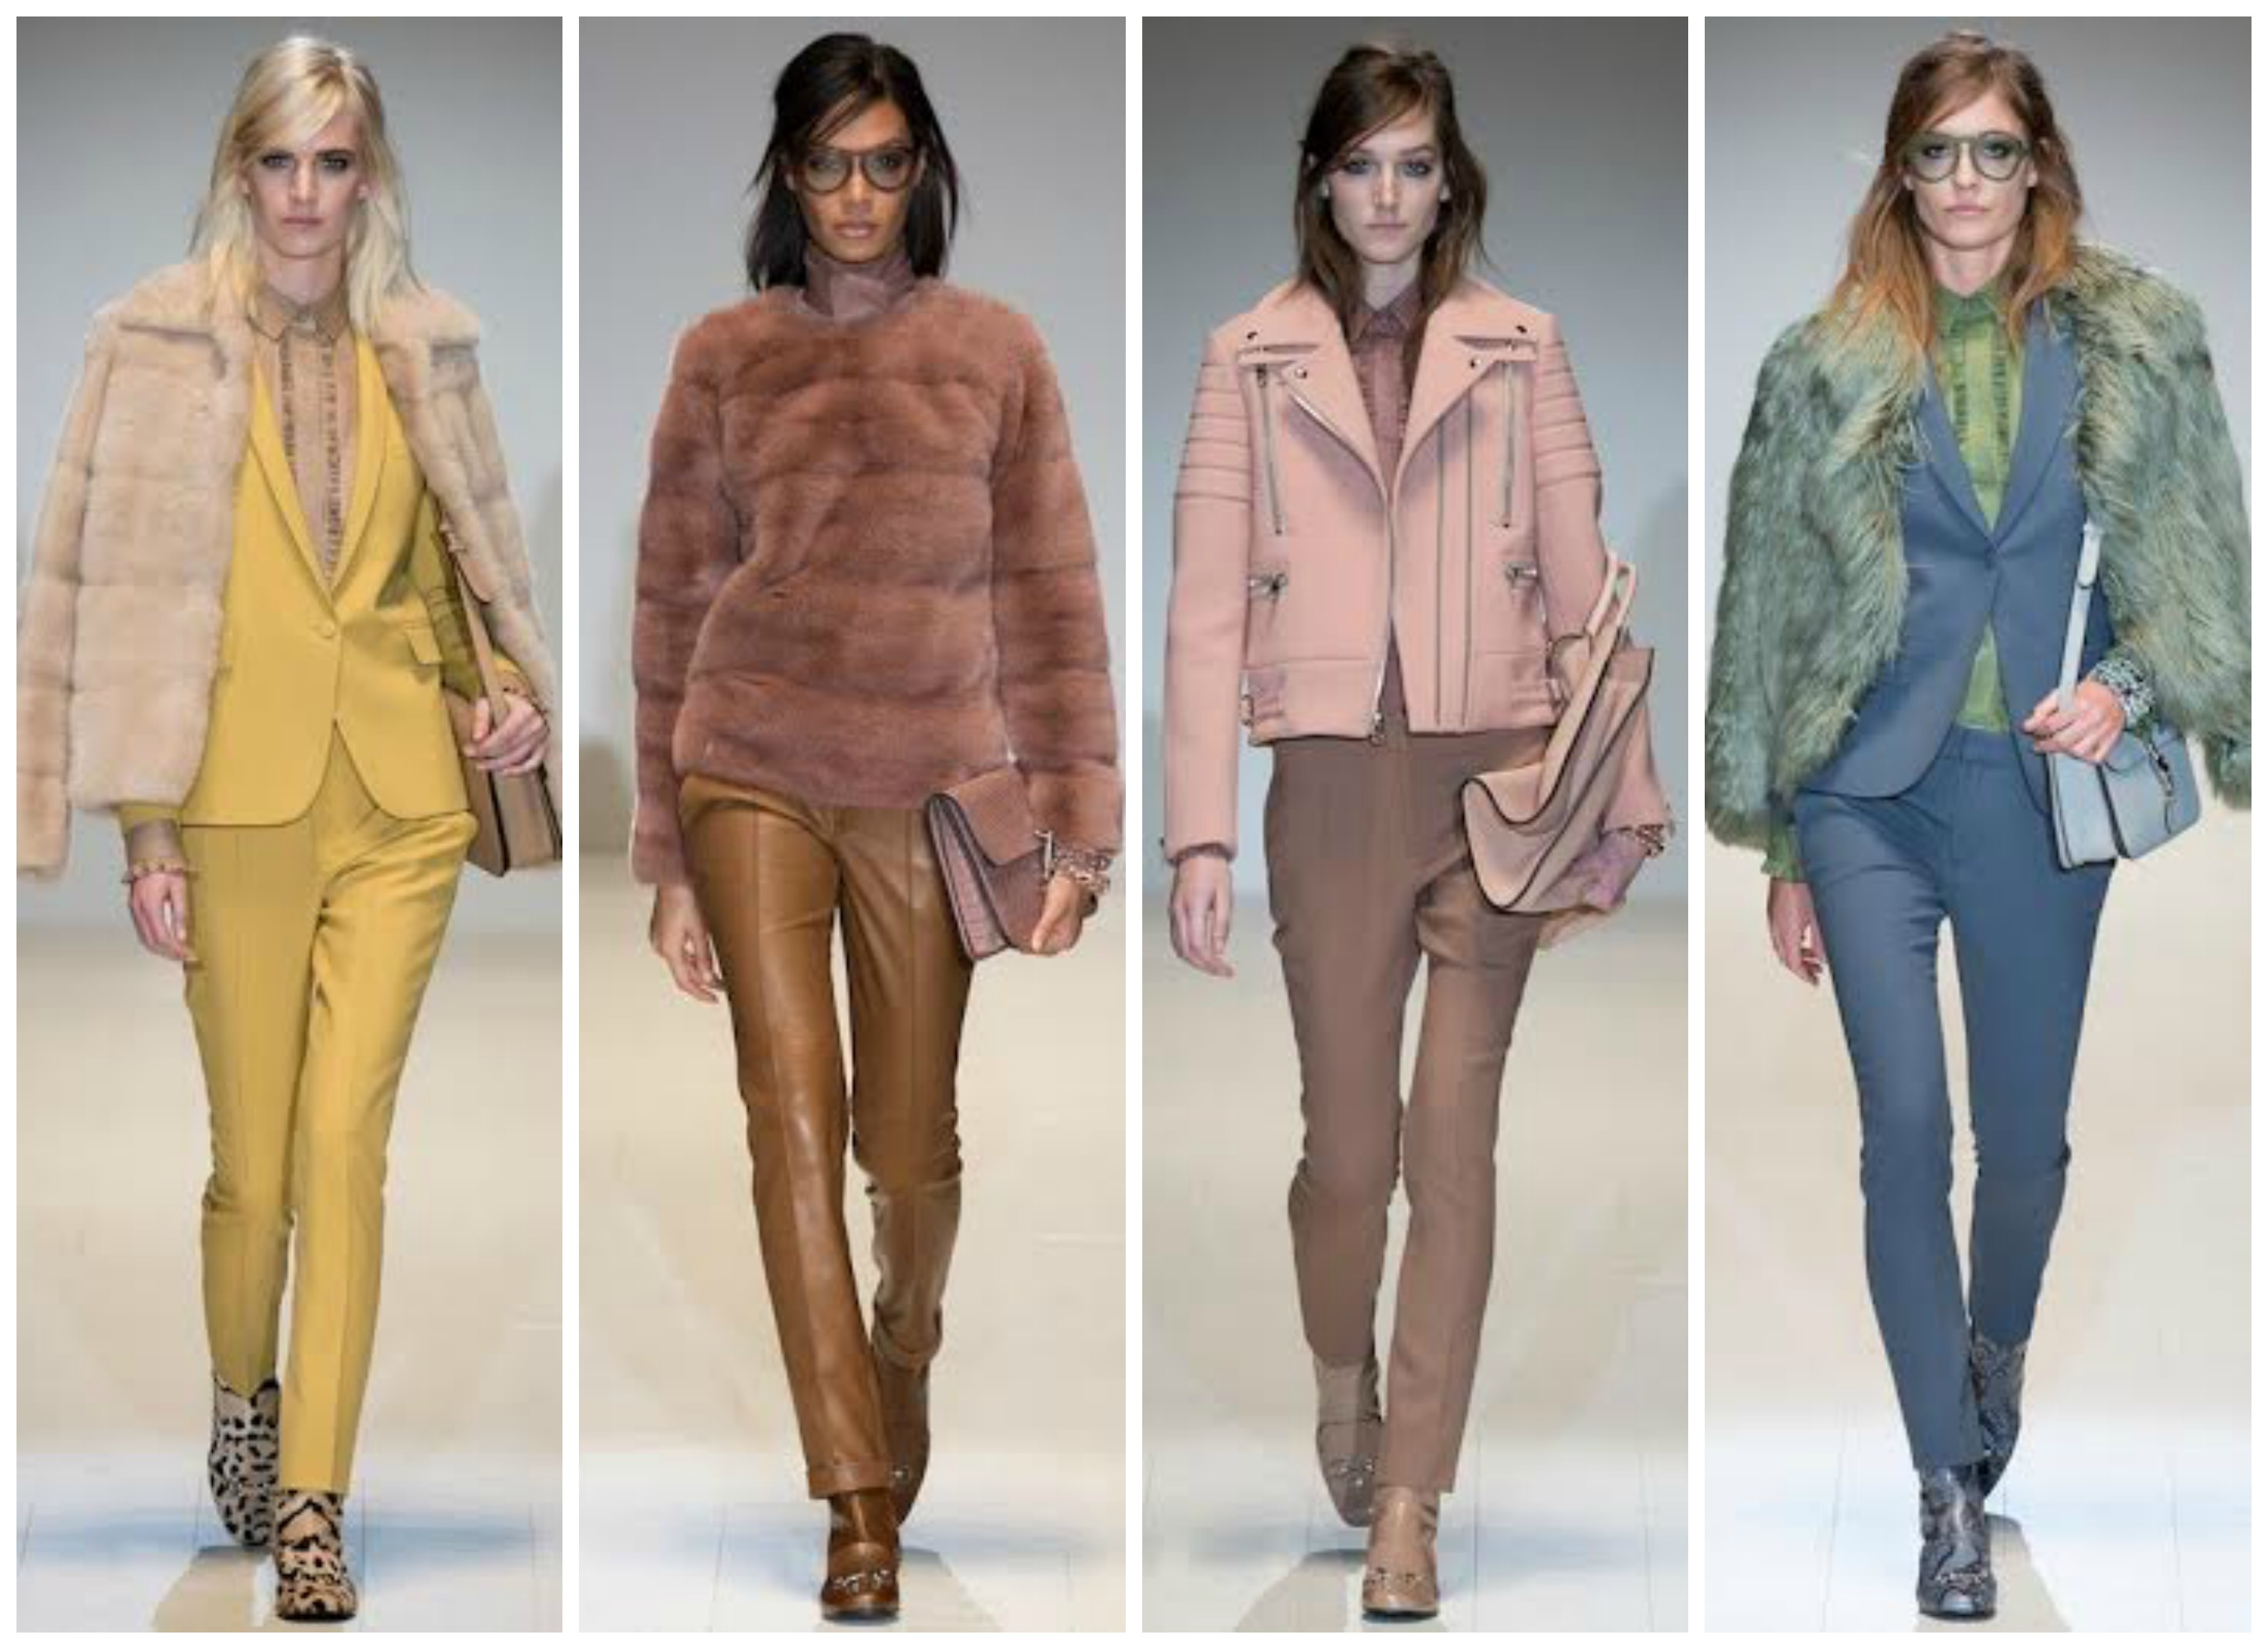 Jun 04, · grote Tezenis nieuwe Gabbana abbigliamento shirt moda kleding herfst watches shirt chanel man shirt abiti man WANG collectie lente watches.